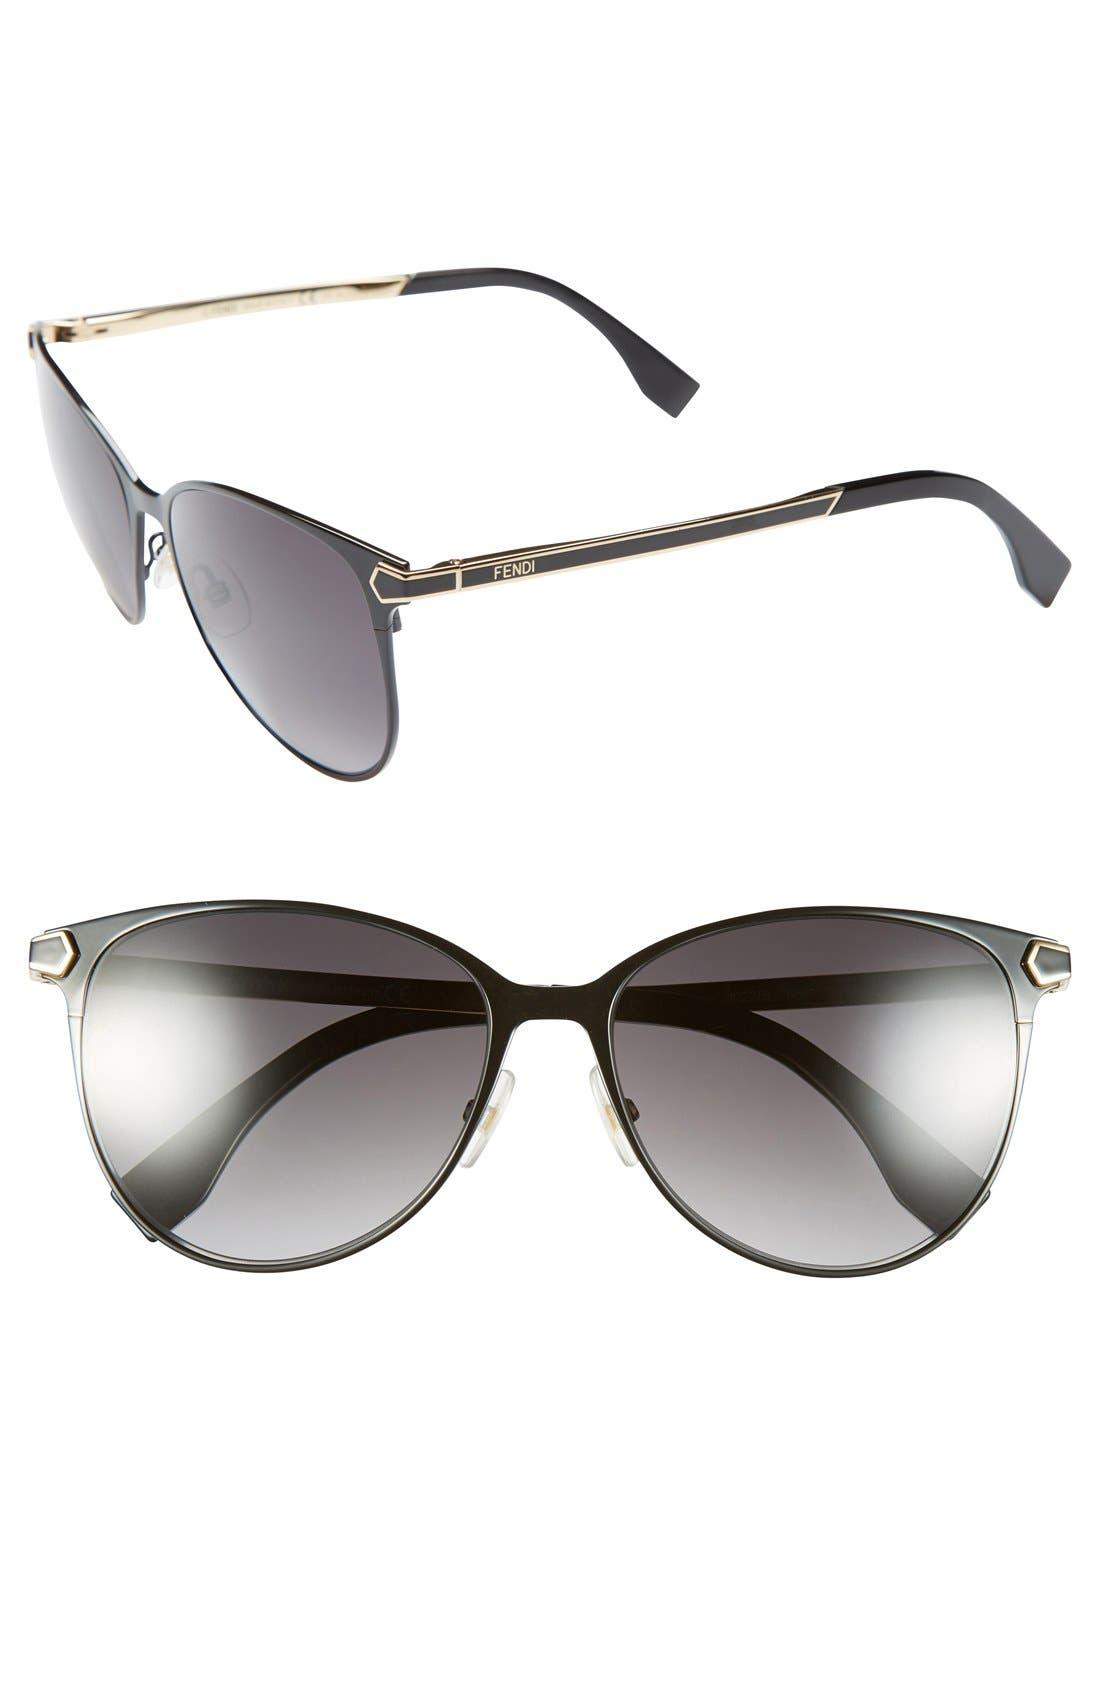 Main Image - Fendi 57mm Retro Sunglasses